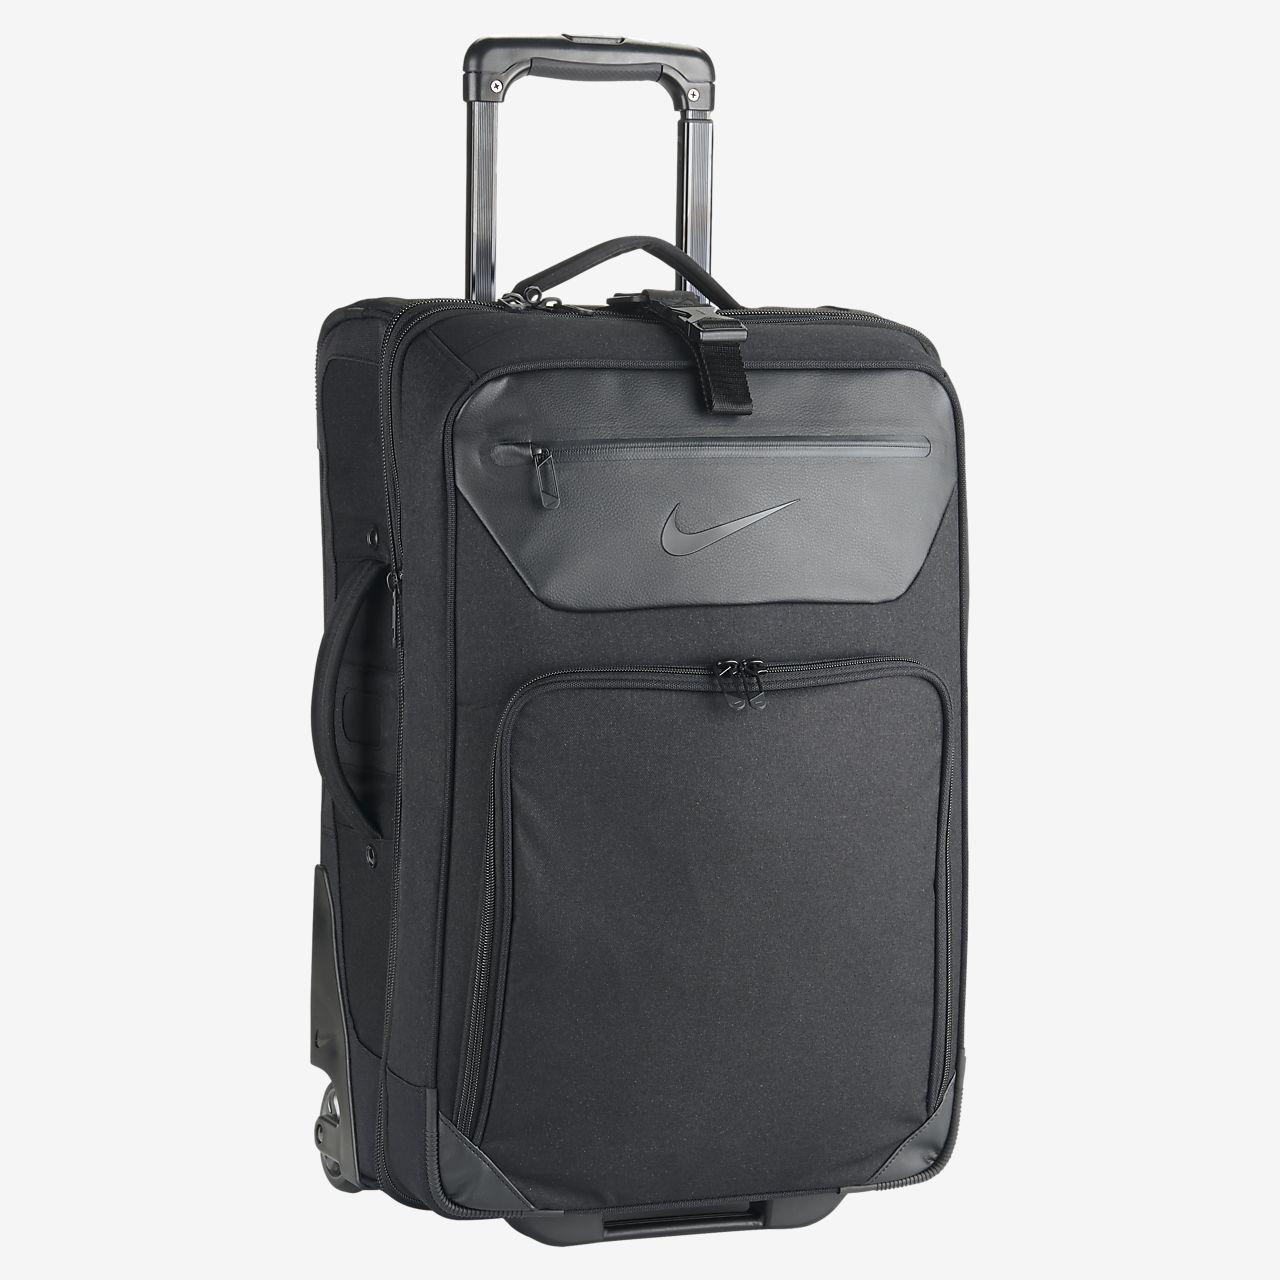 Nike Departure Iii Roller Bag